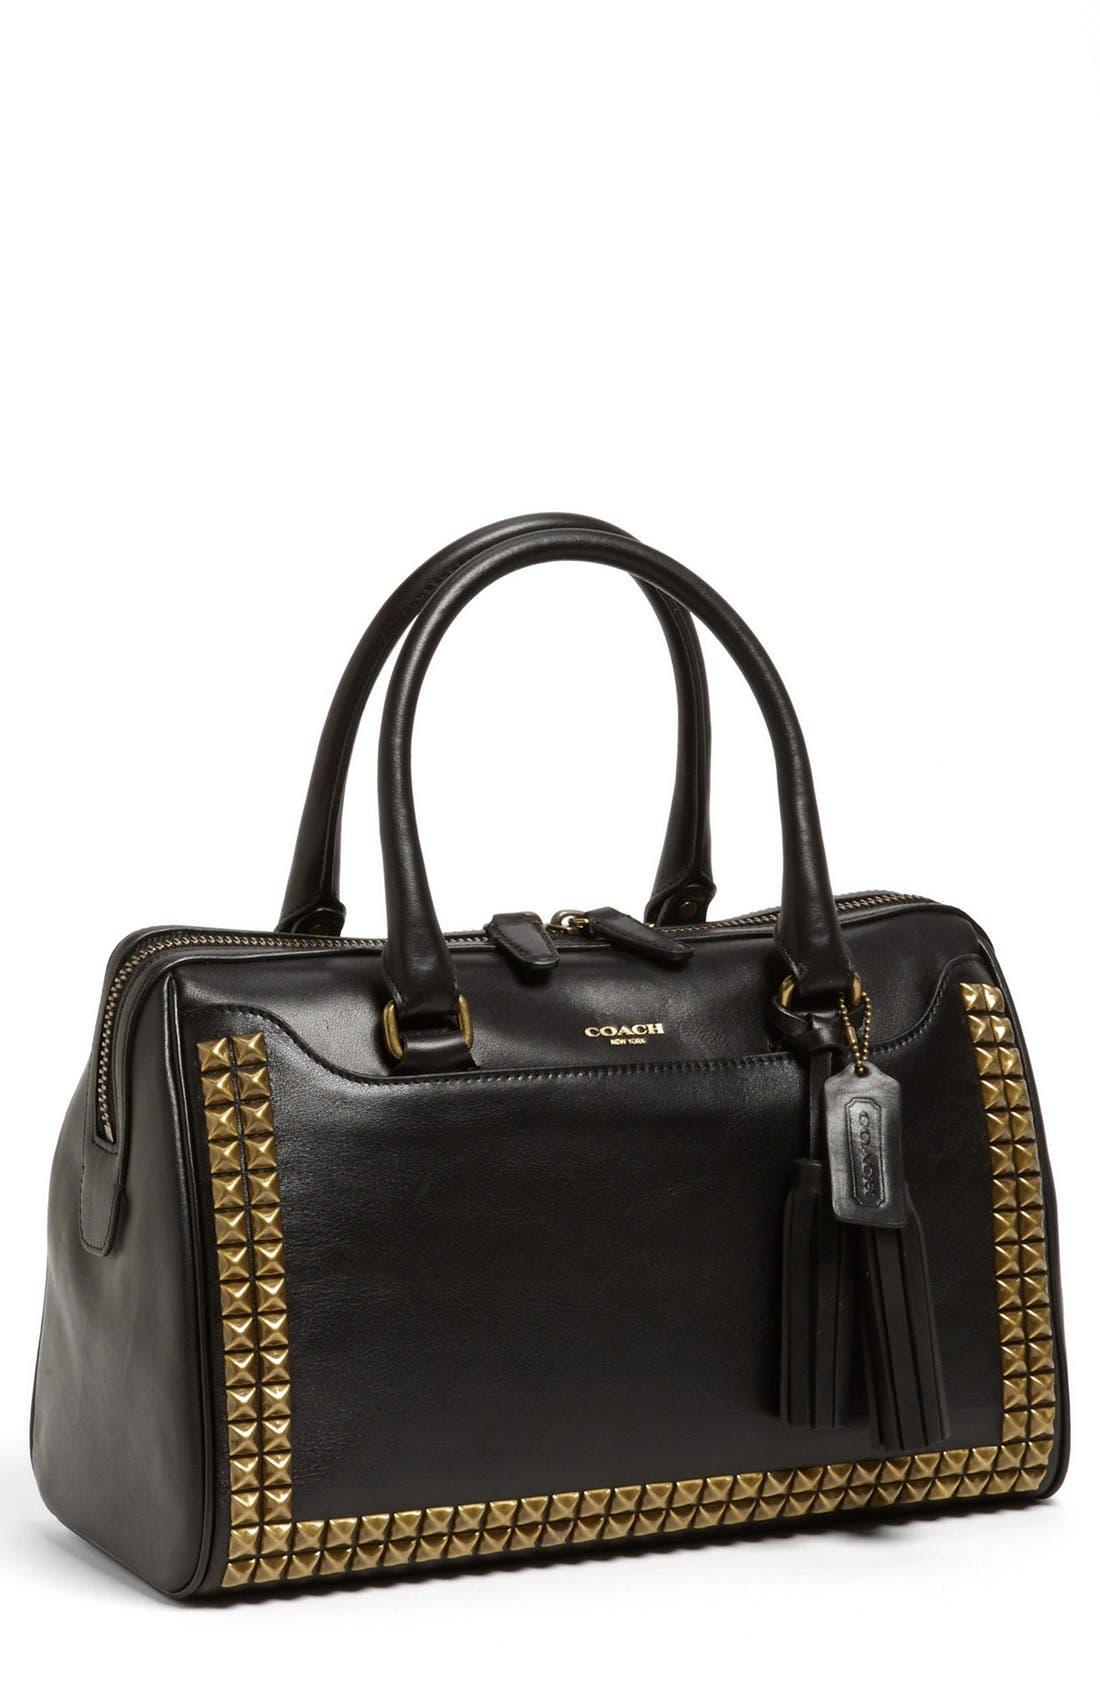 Main Image - COACH 'Legacy Hayley - Stud' Leather Satchel